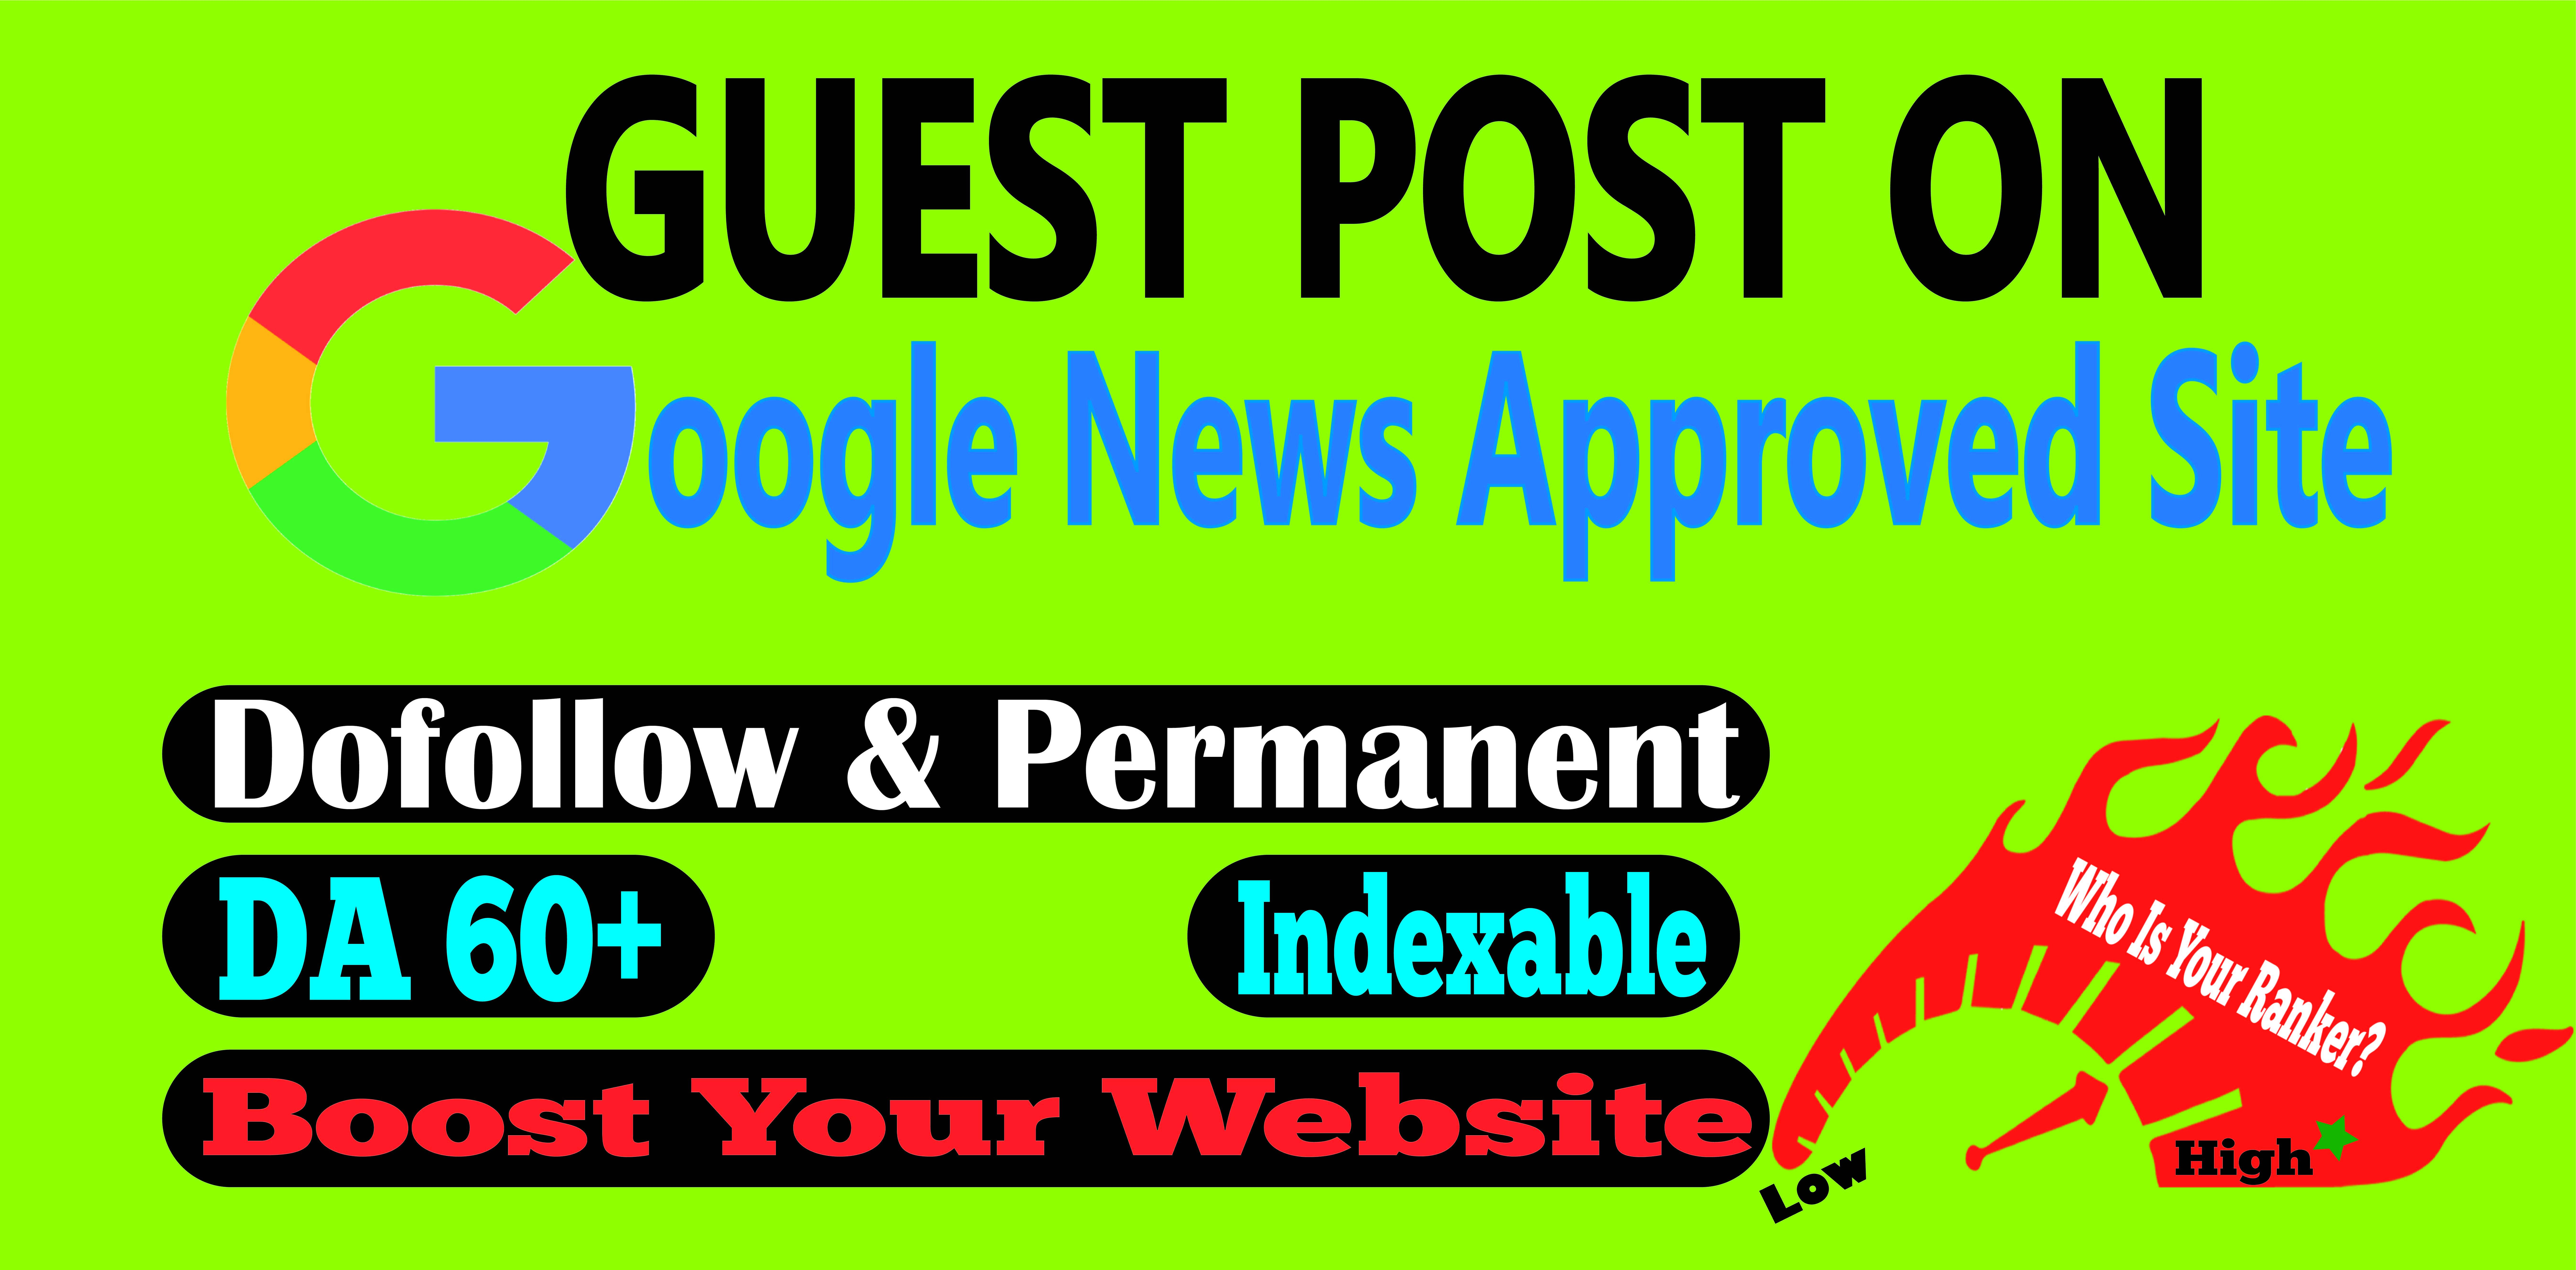 Publish Guest Post Backlinks on Premium Google News Approve Websites DA60+